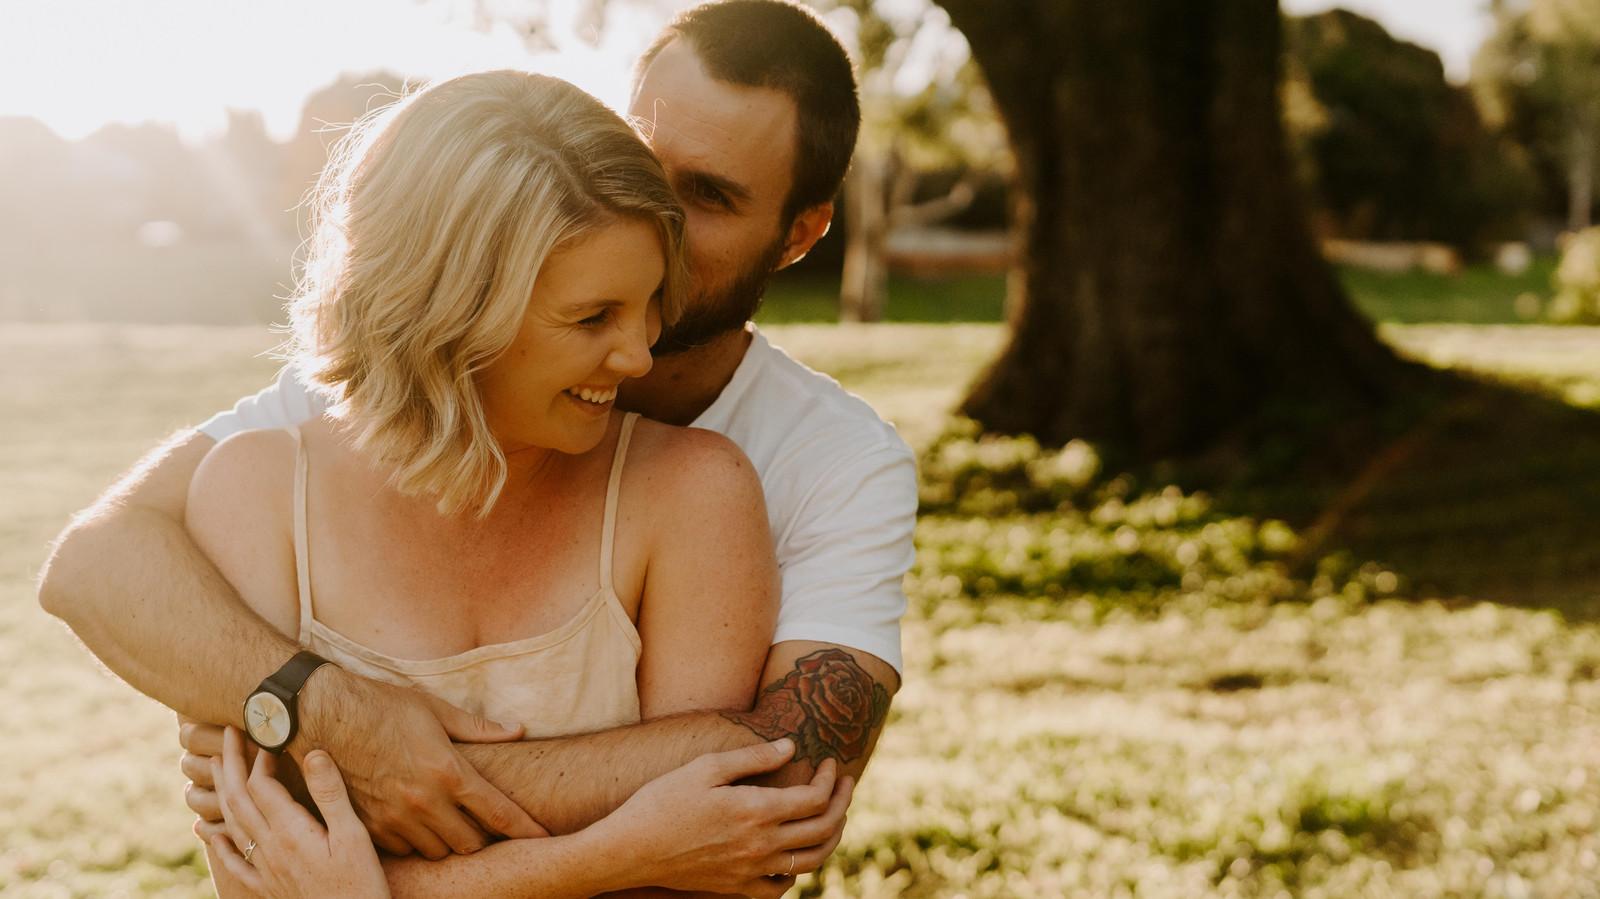 Byron Bay Online Dating